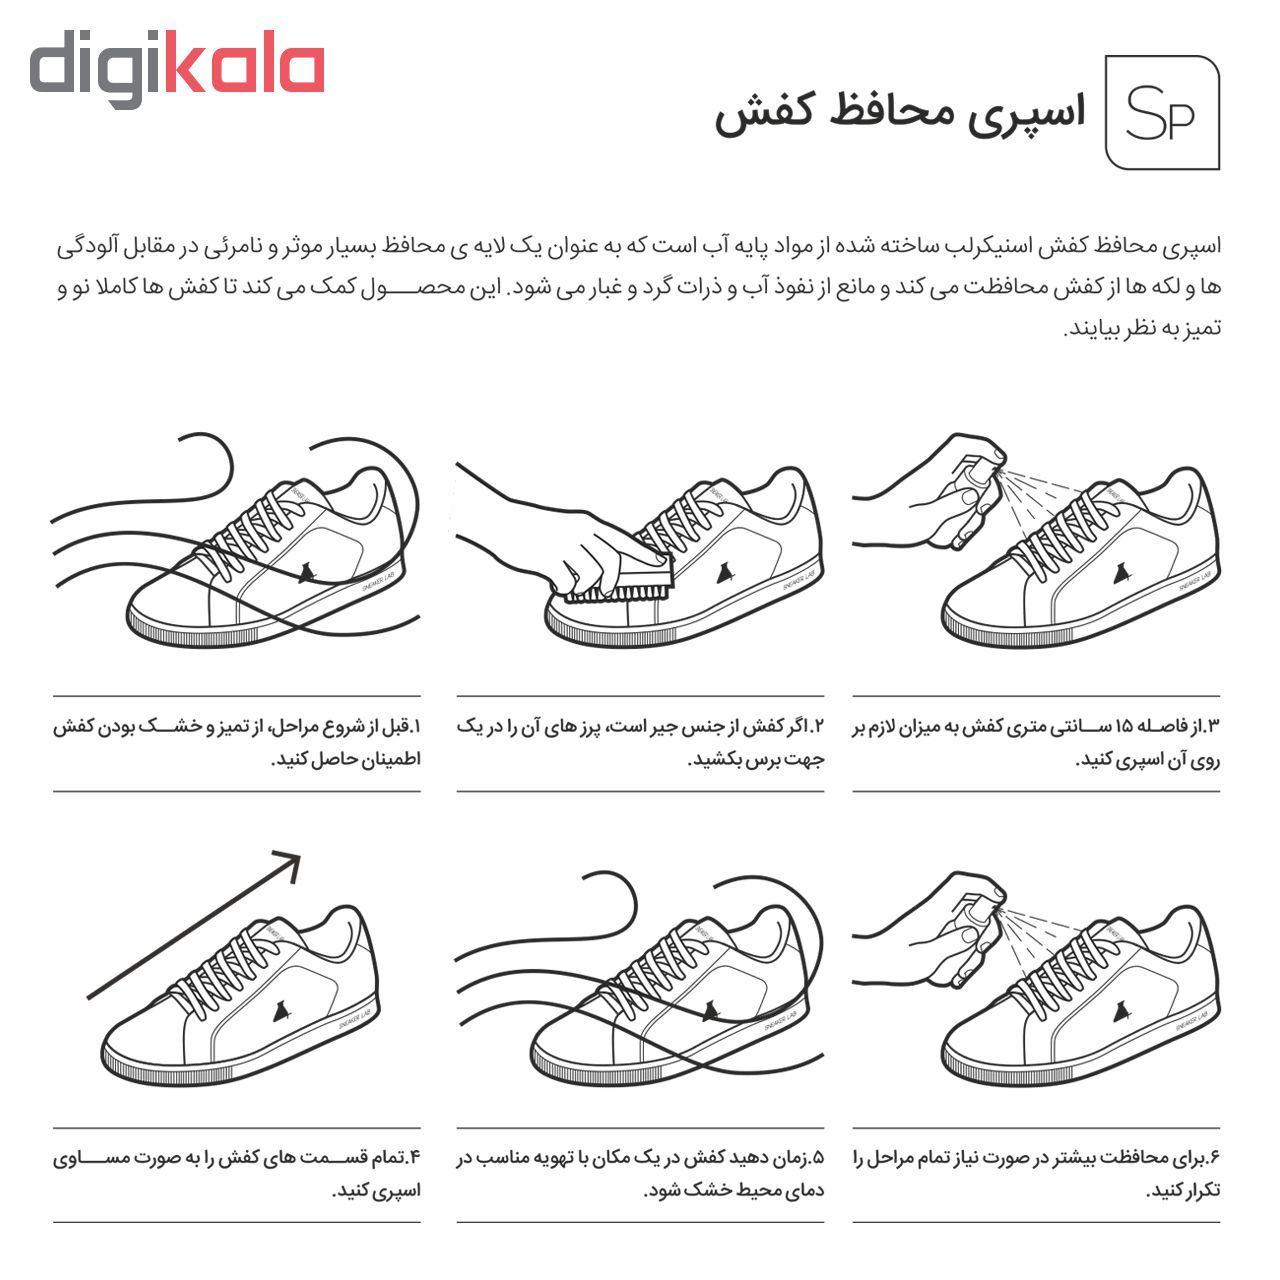 اسپری محافظت کننده کفش اسنیکرلب مدل SP-SNEAKER PROTECTOR